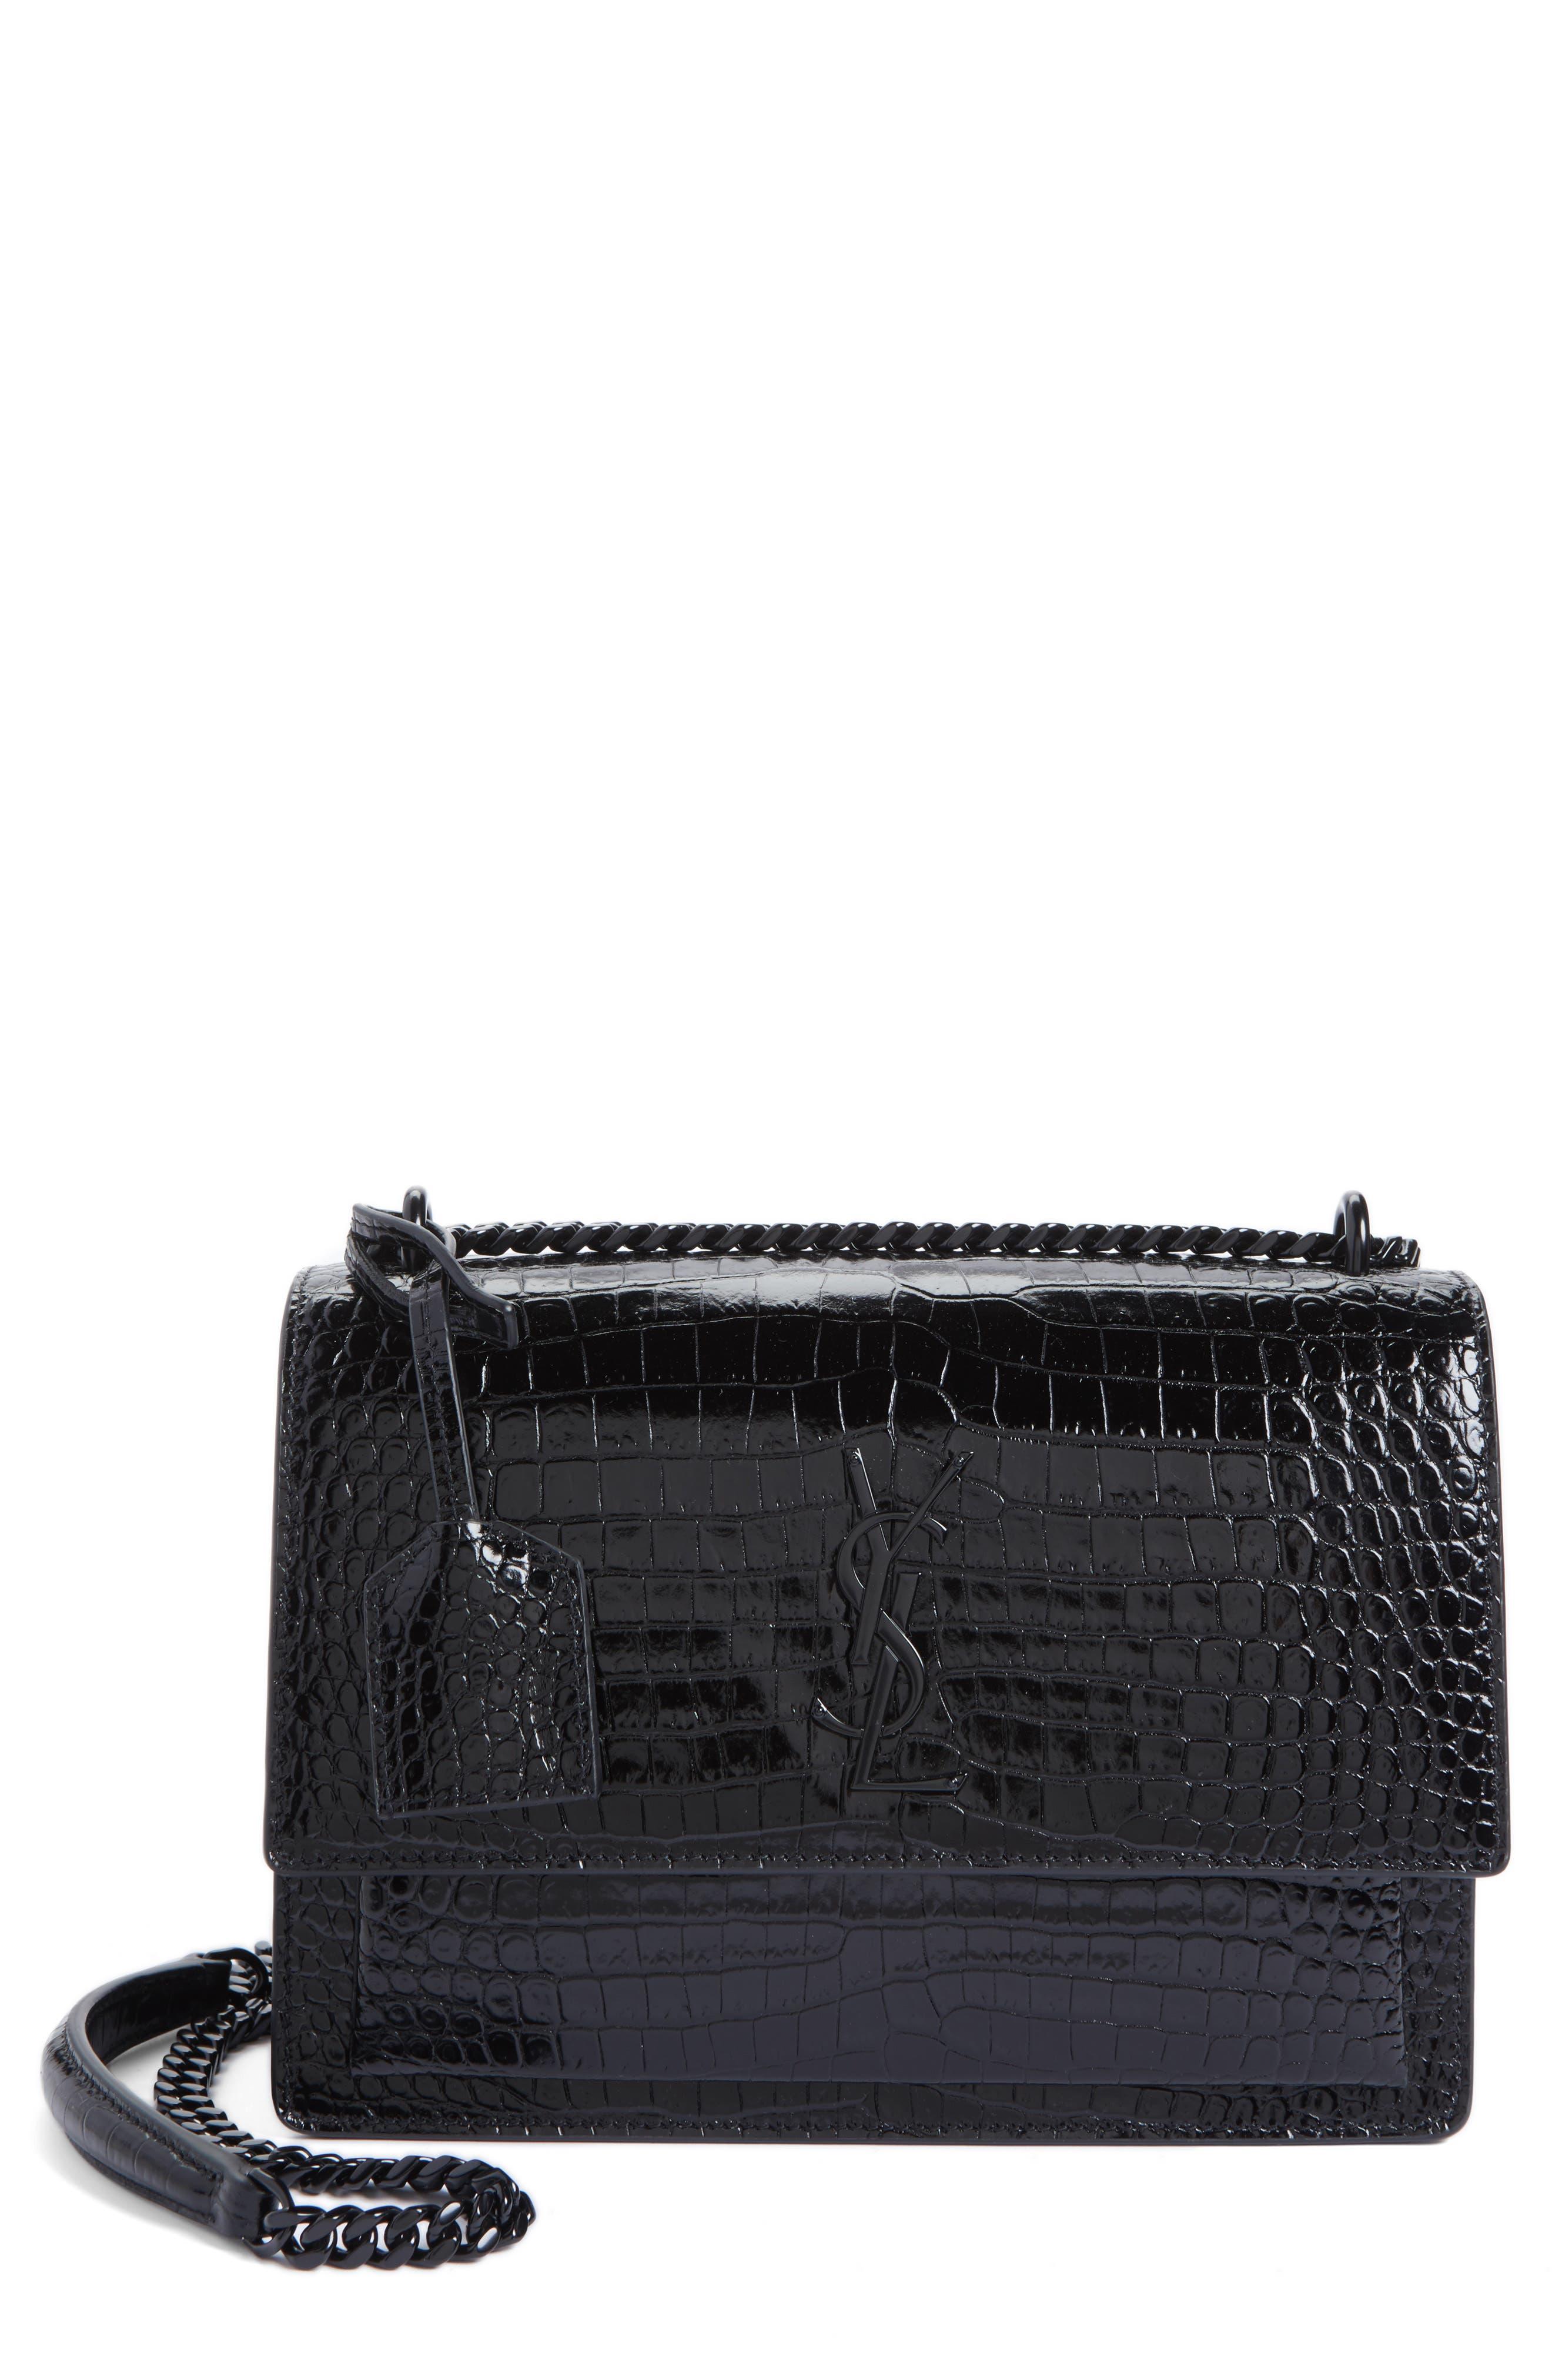 Medium Sunset Croc Embossed Leather Shoulder Bag,                             Main thumbnail 1, color,                             001